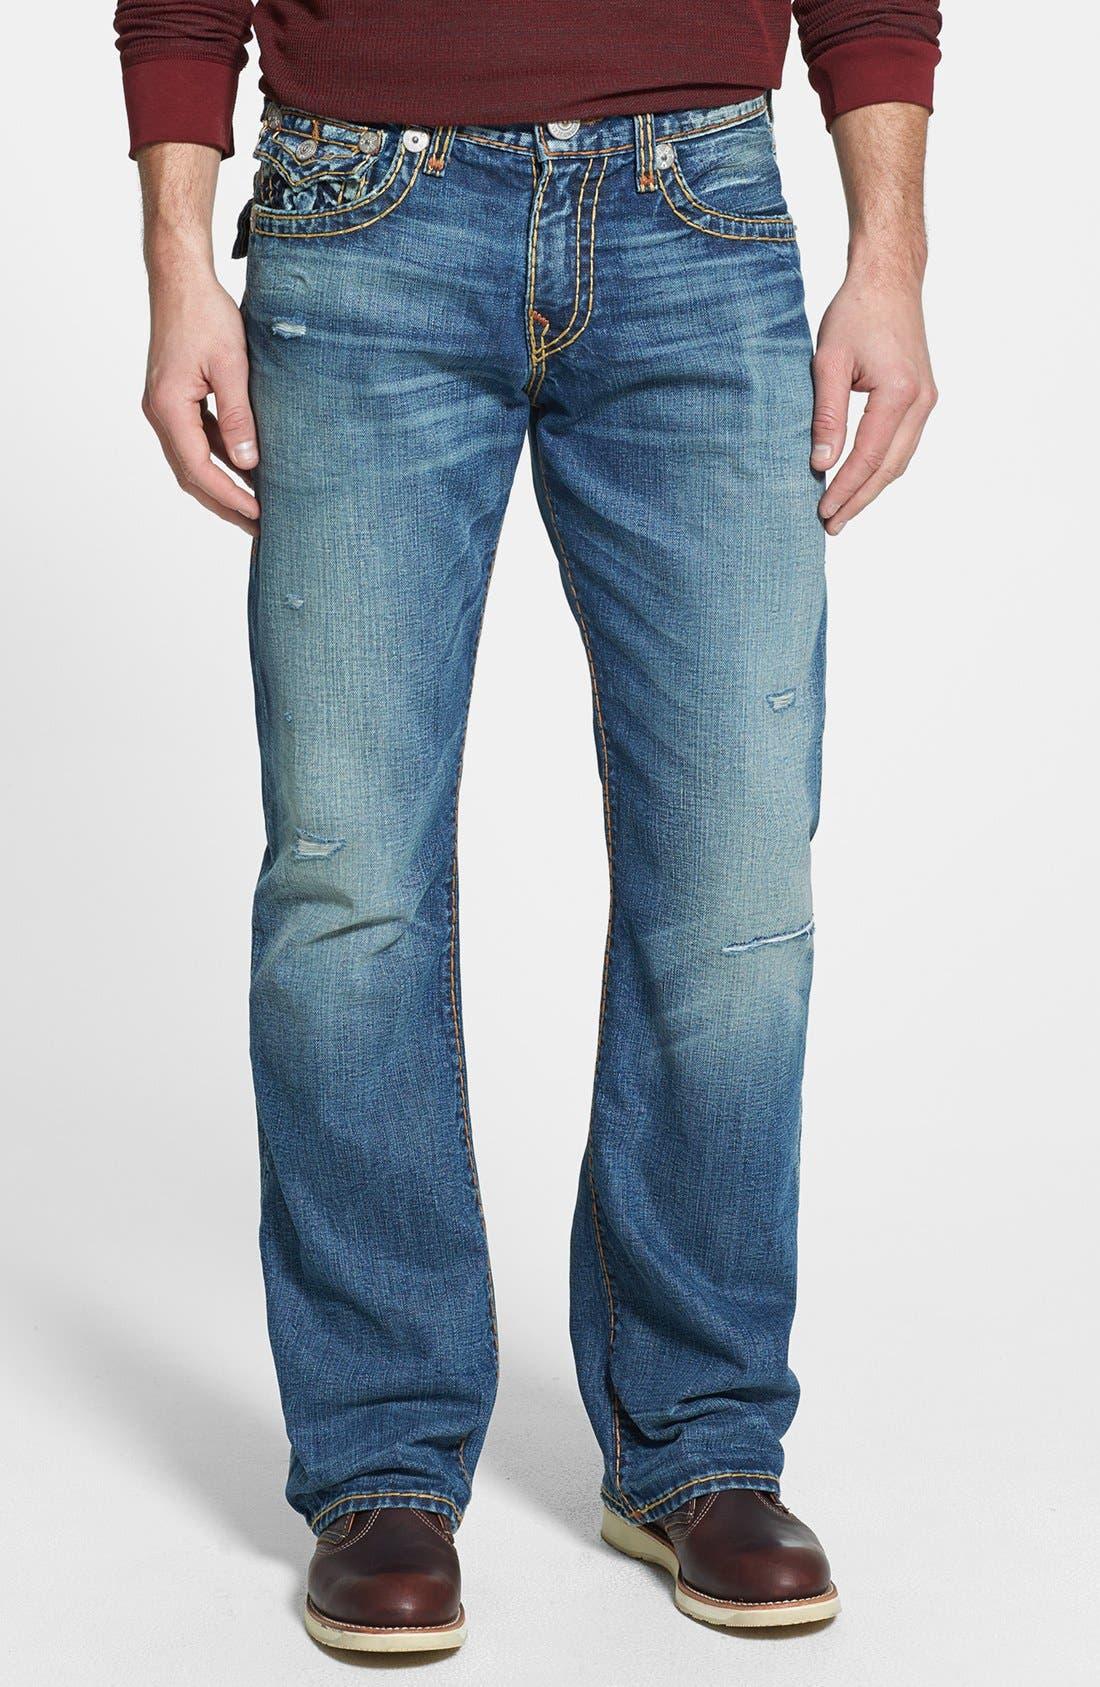 Alternate Image 2  - True Religion Brand Jeans 'Billy' Bootcut Jeans (Bafm Hot Springs)